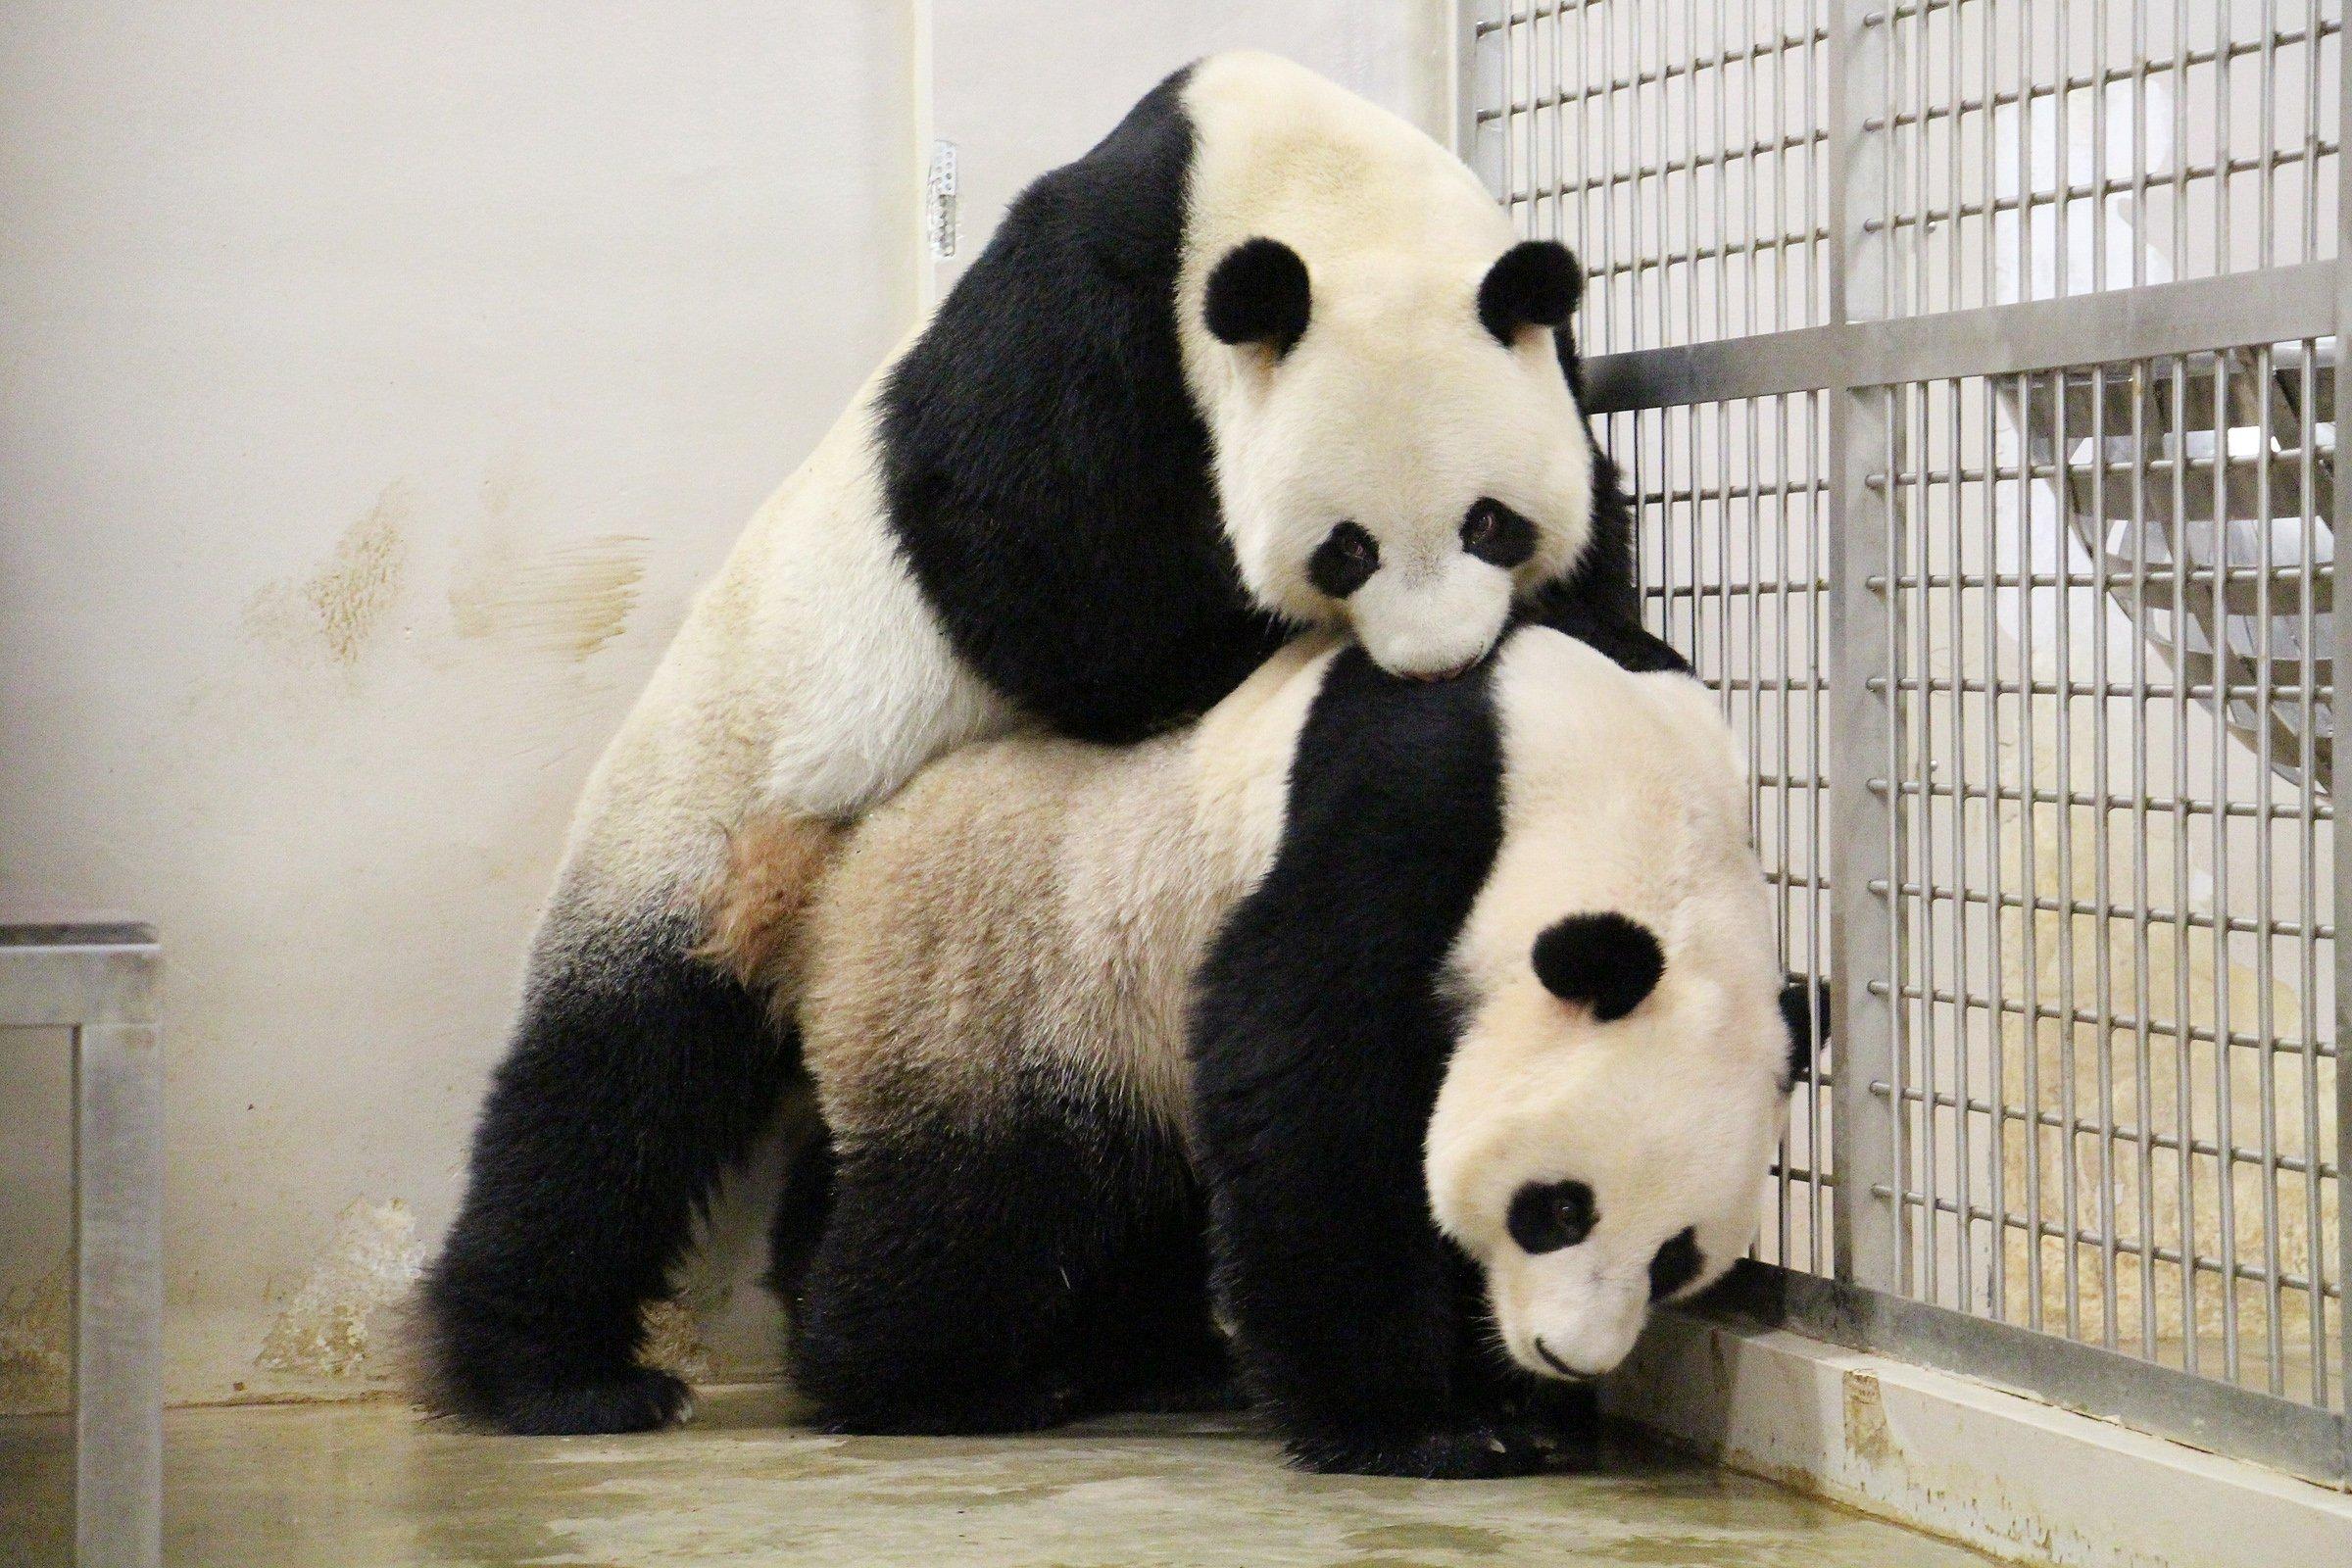 Singapore Invades Pandas Privacy and Showcases #PandaPorn